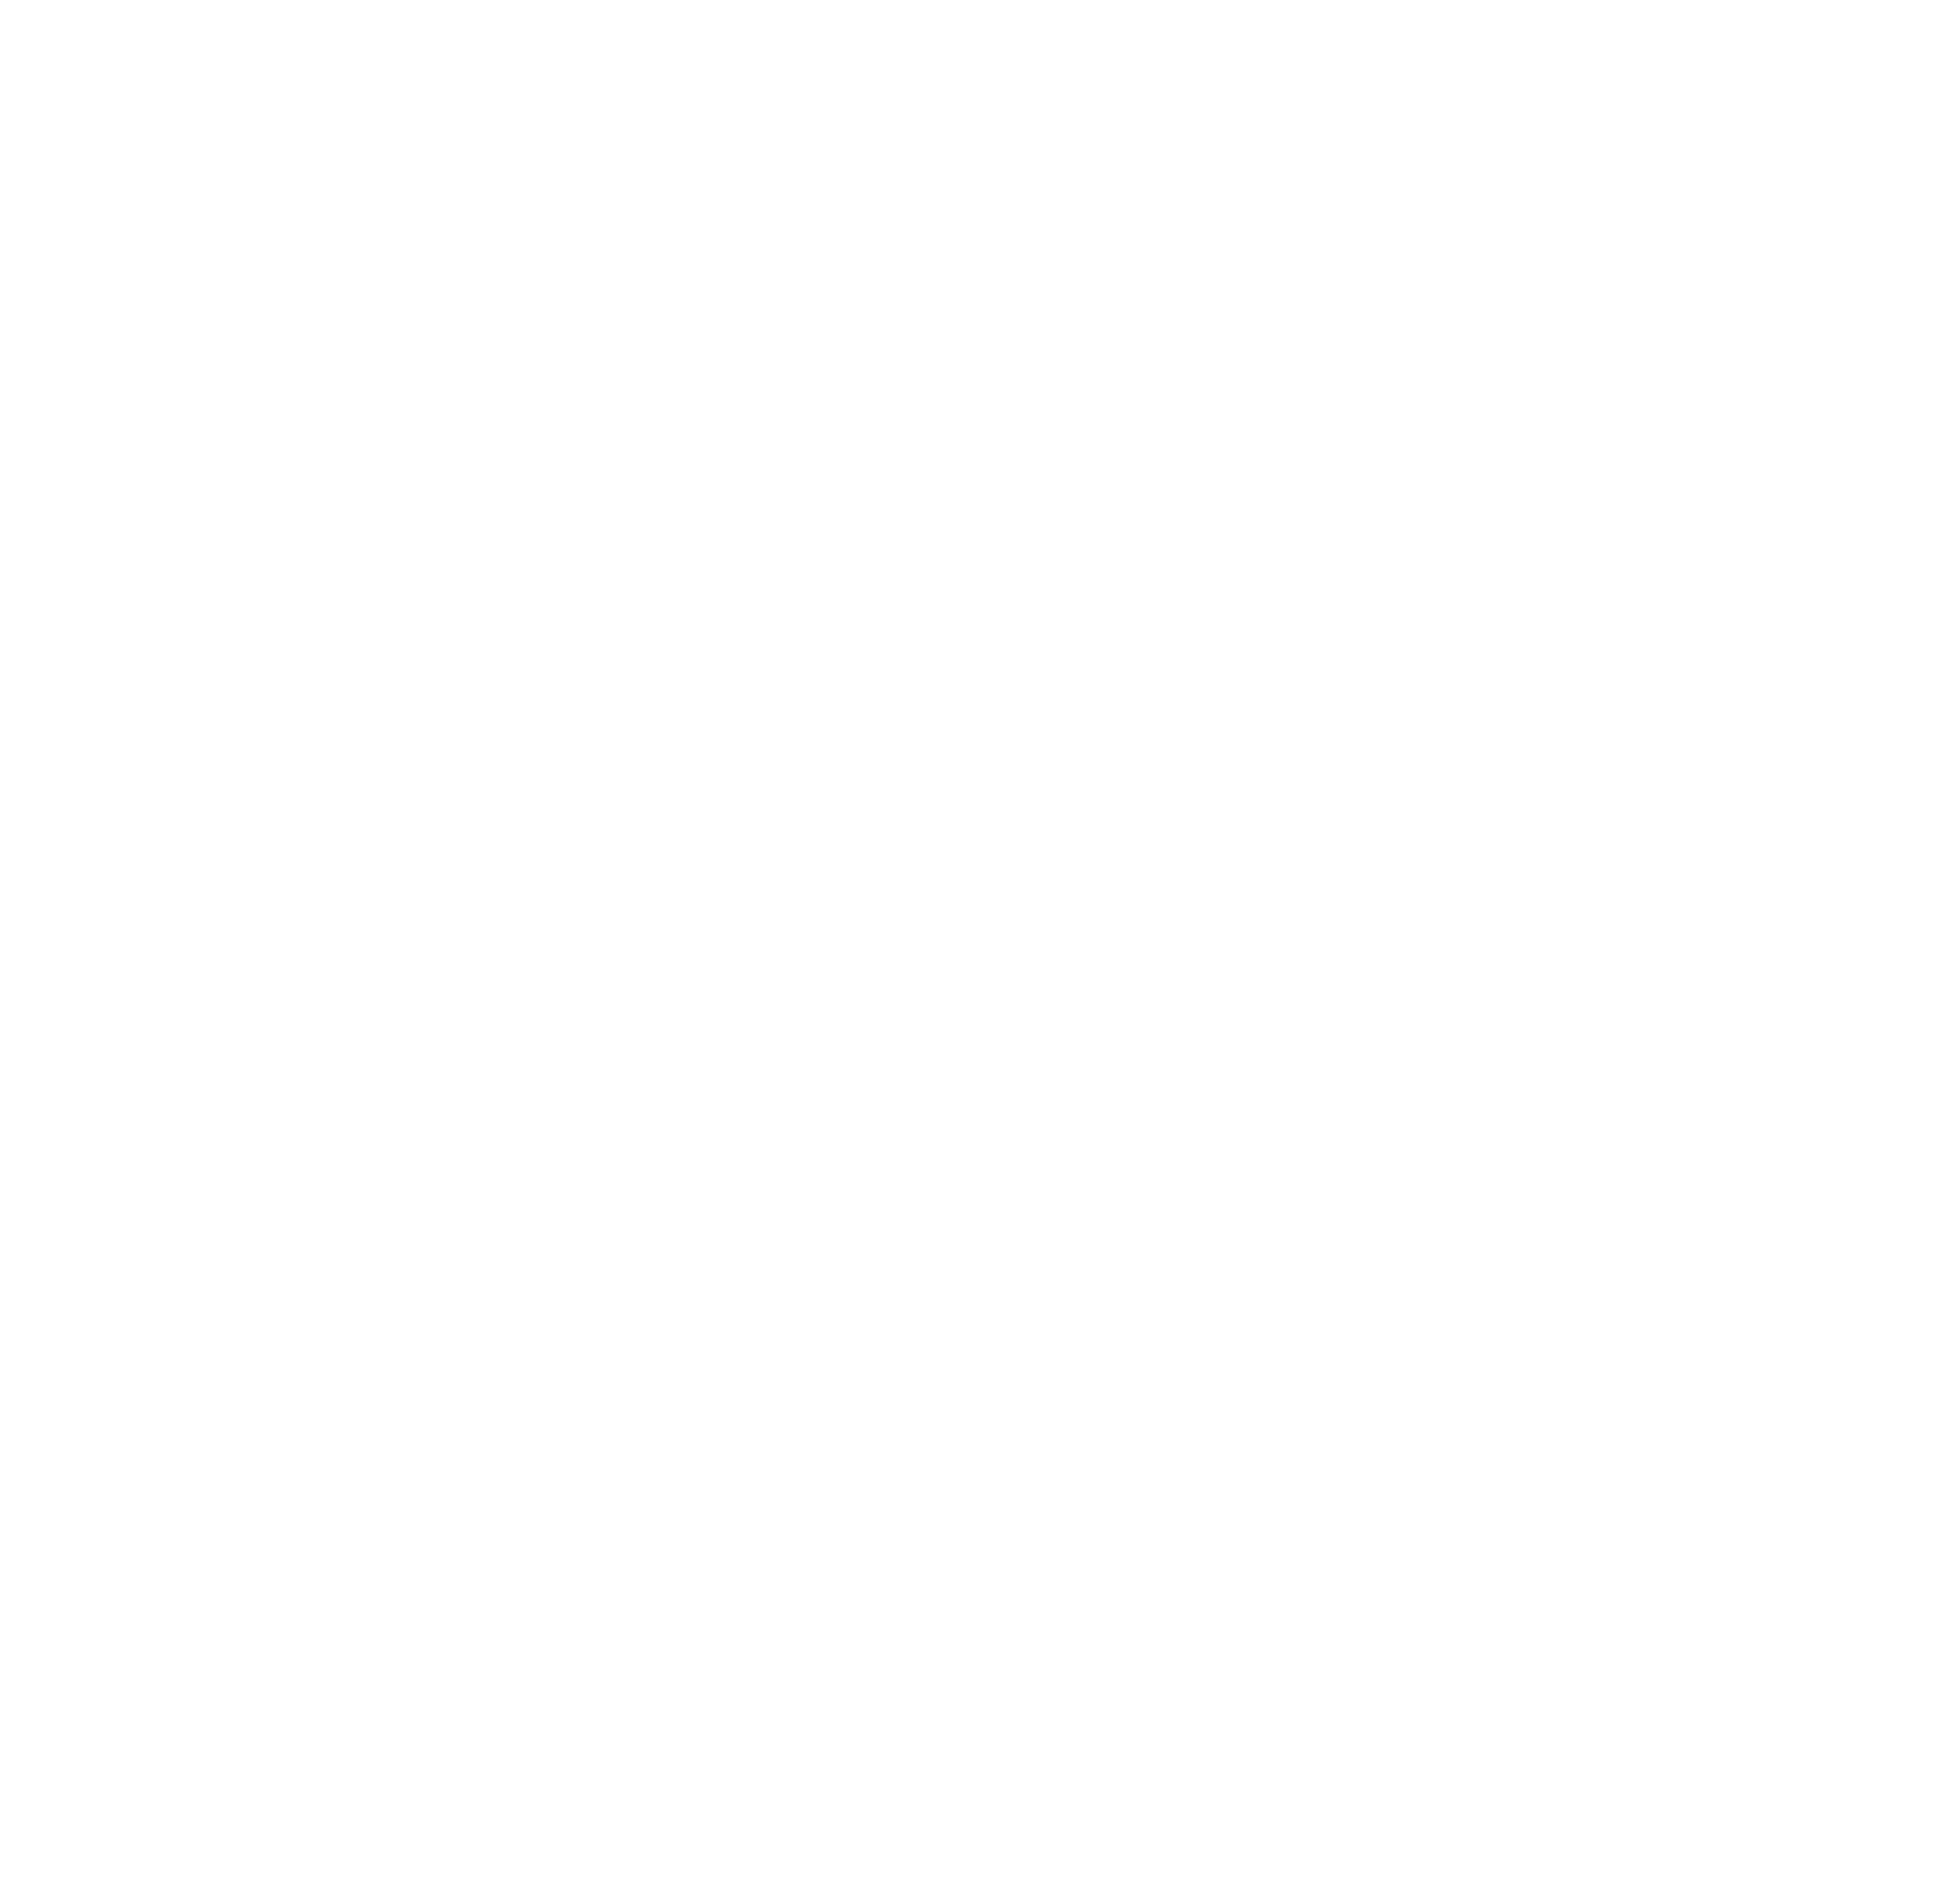 cropped-cropped-BergnBeef-Logo-Negativ@4x.png